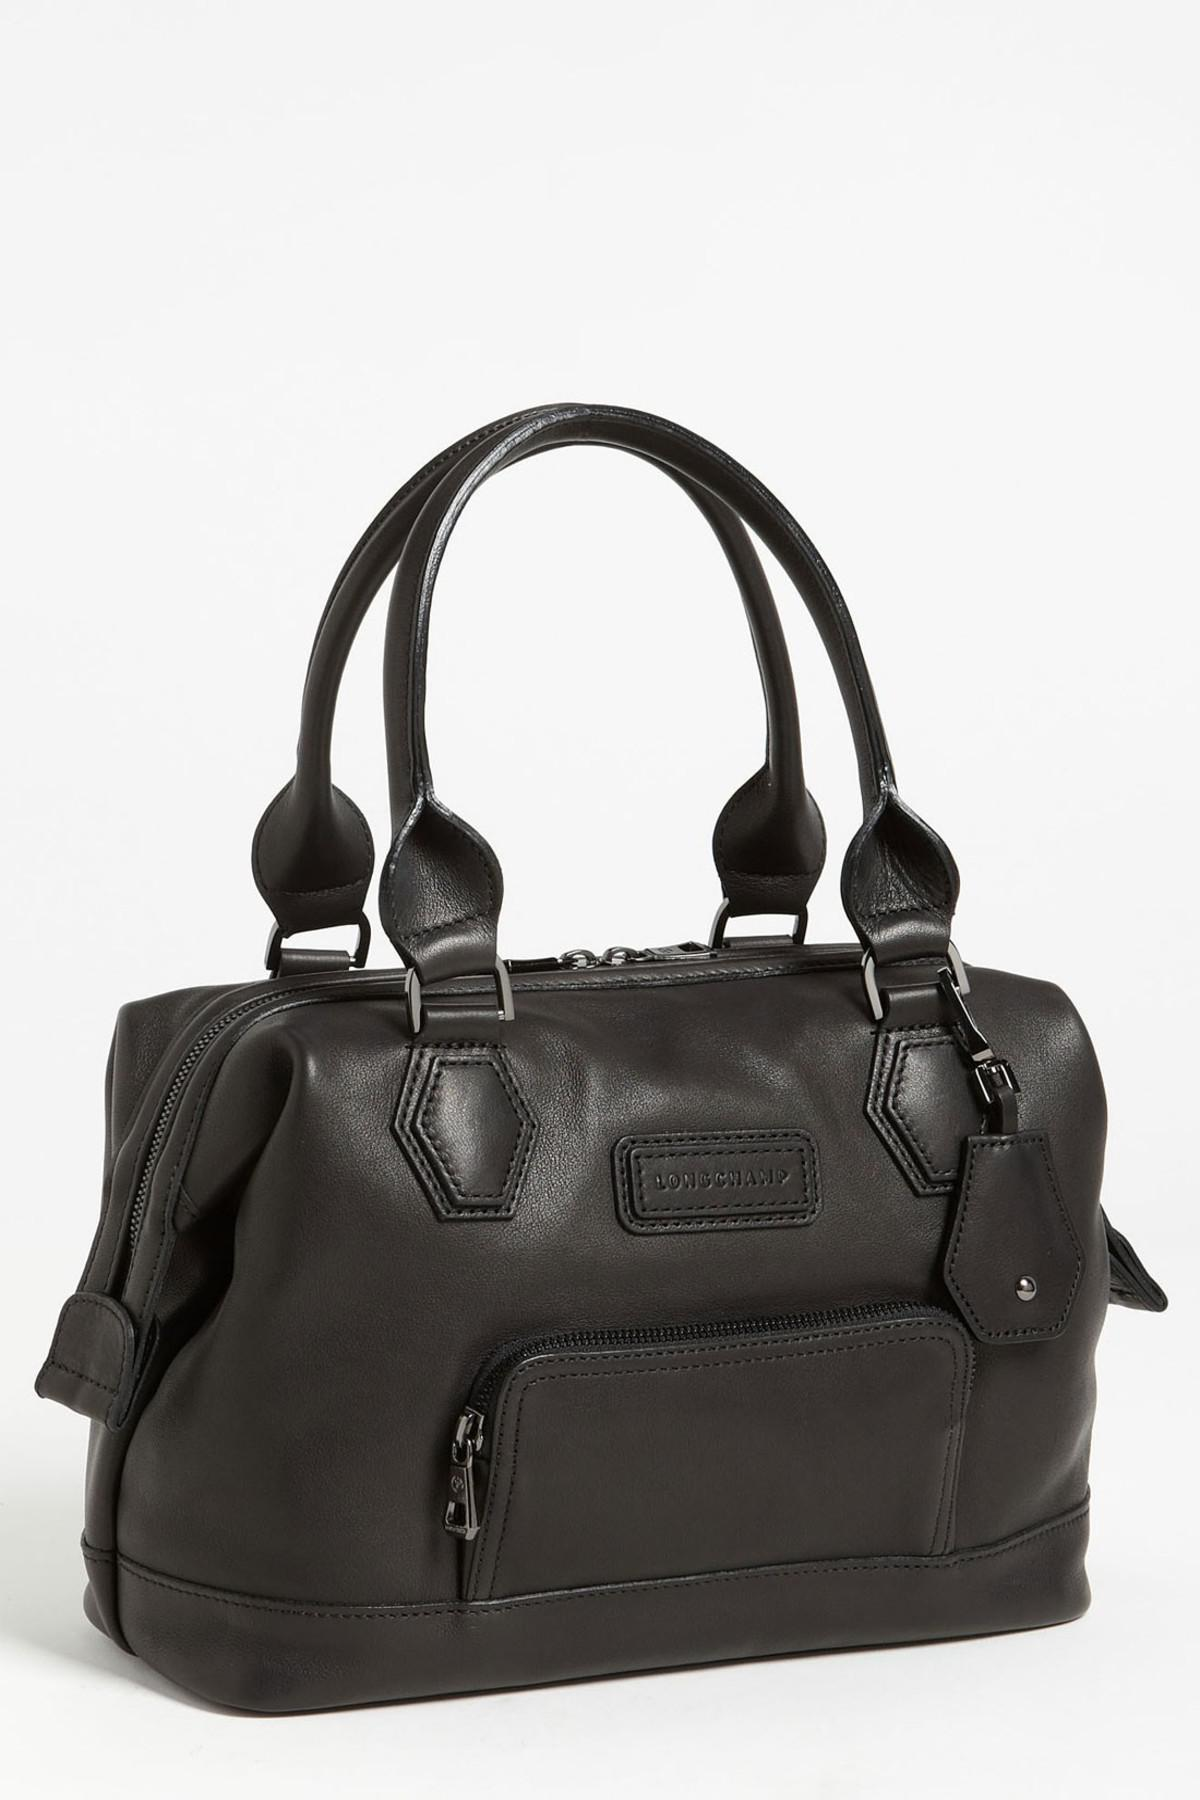 a1e754f5b5ef Lyst - Longchamp Legende Sport Leather Handbag in Black